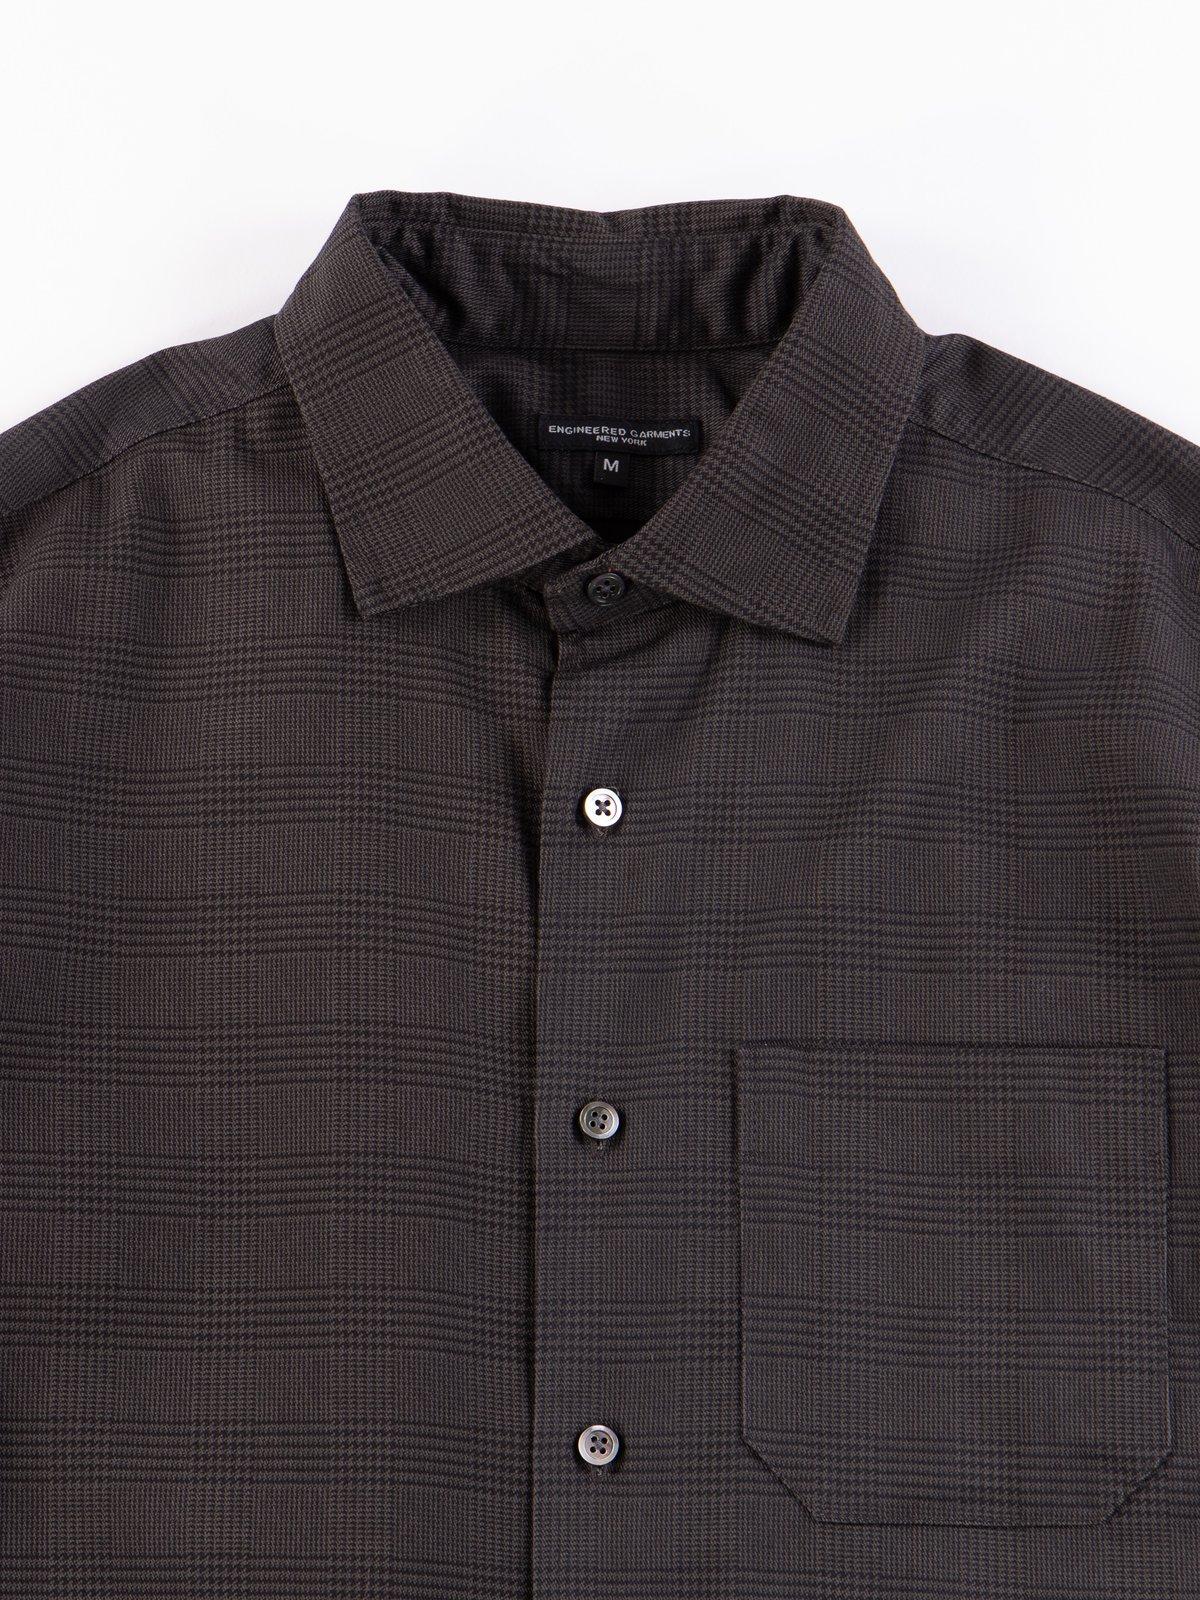 Grey Twill Printed Glen Plaid Spread Collar Shirt - Image 3